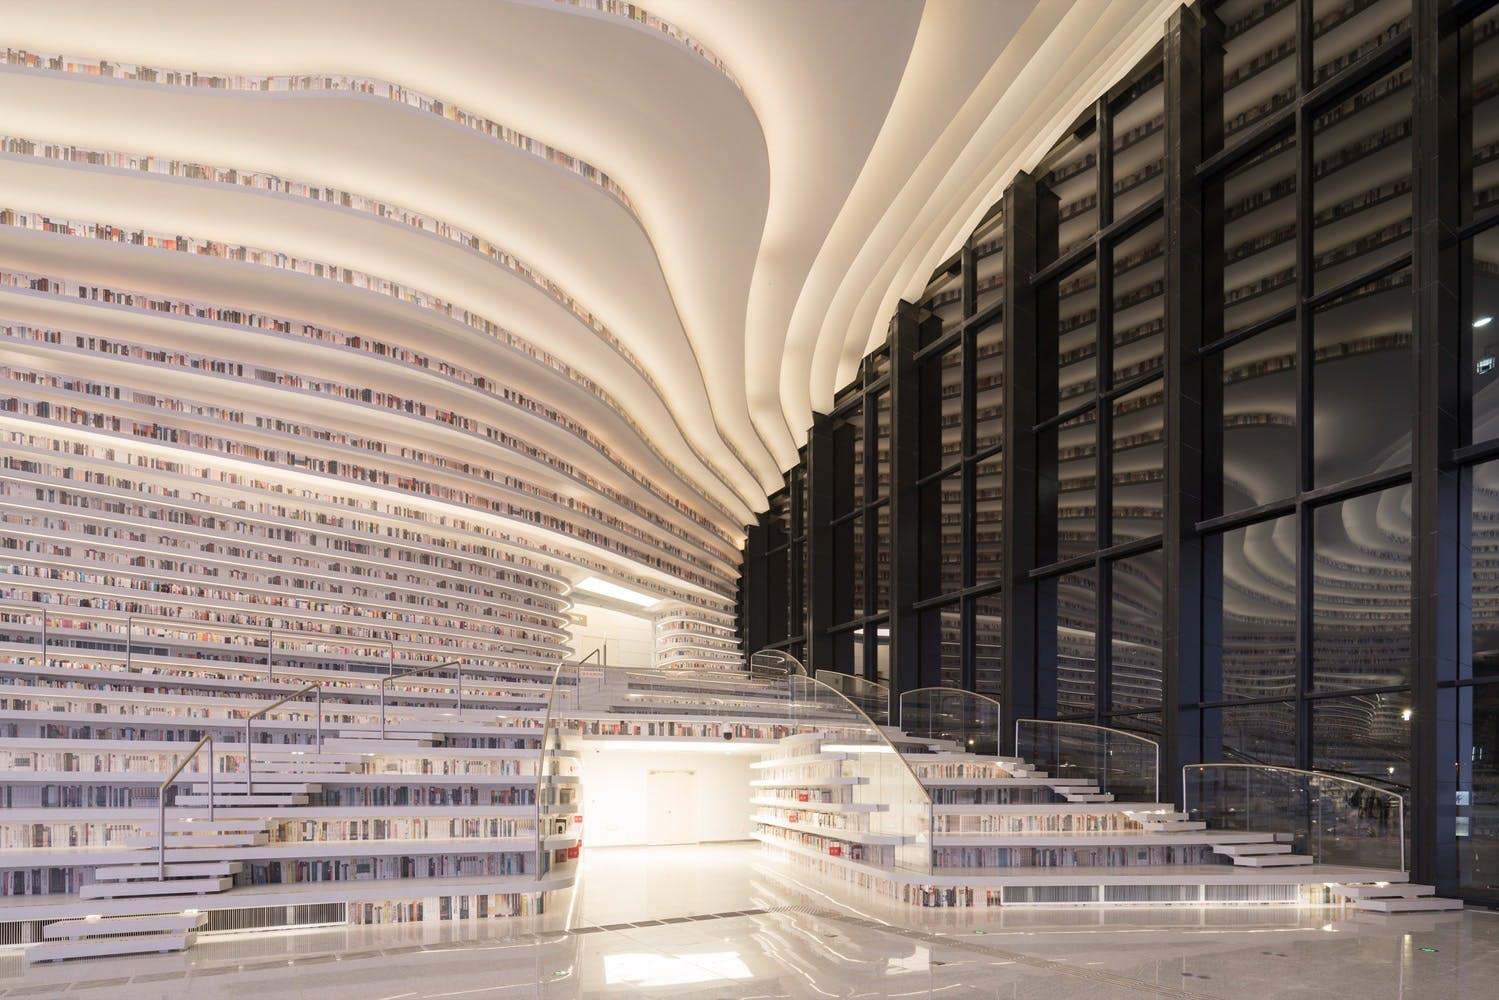 bibliotek kina arkitektur struktur bøger design